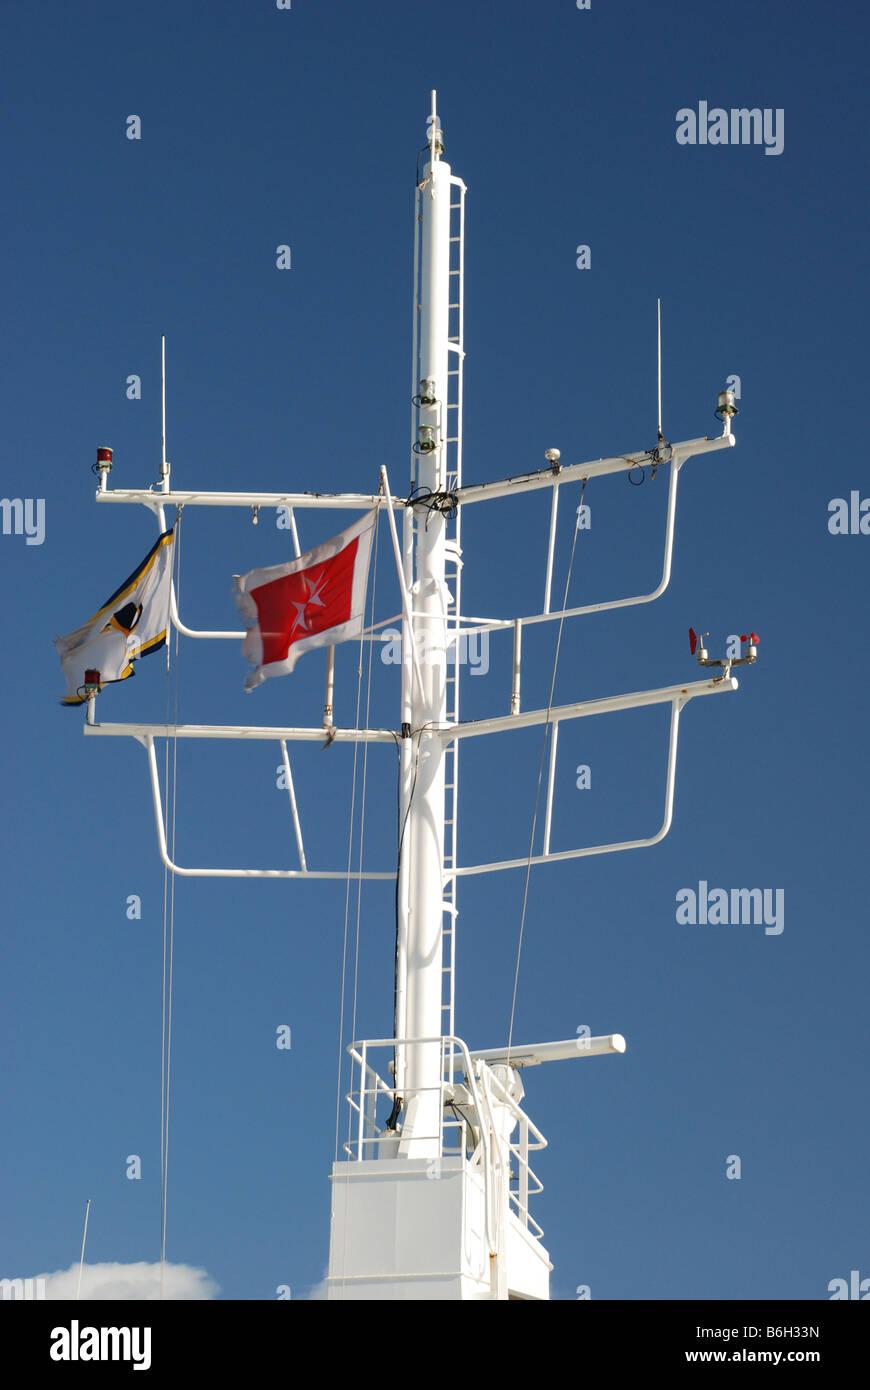 Communications Mast Boat Stock Photos Amp Communications